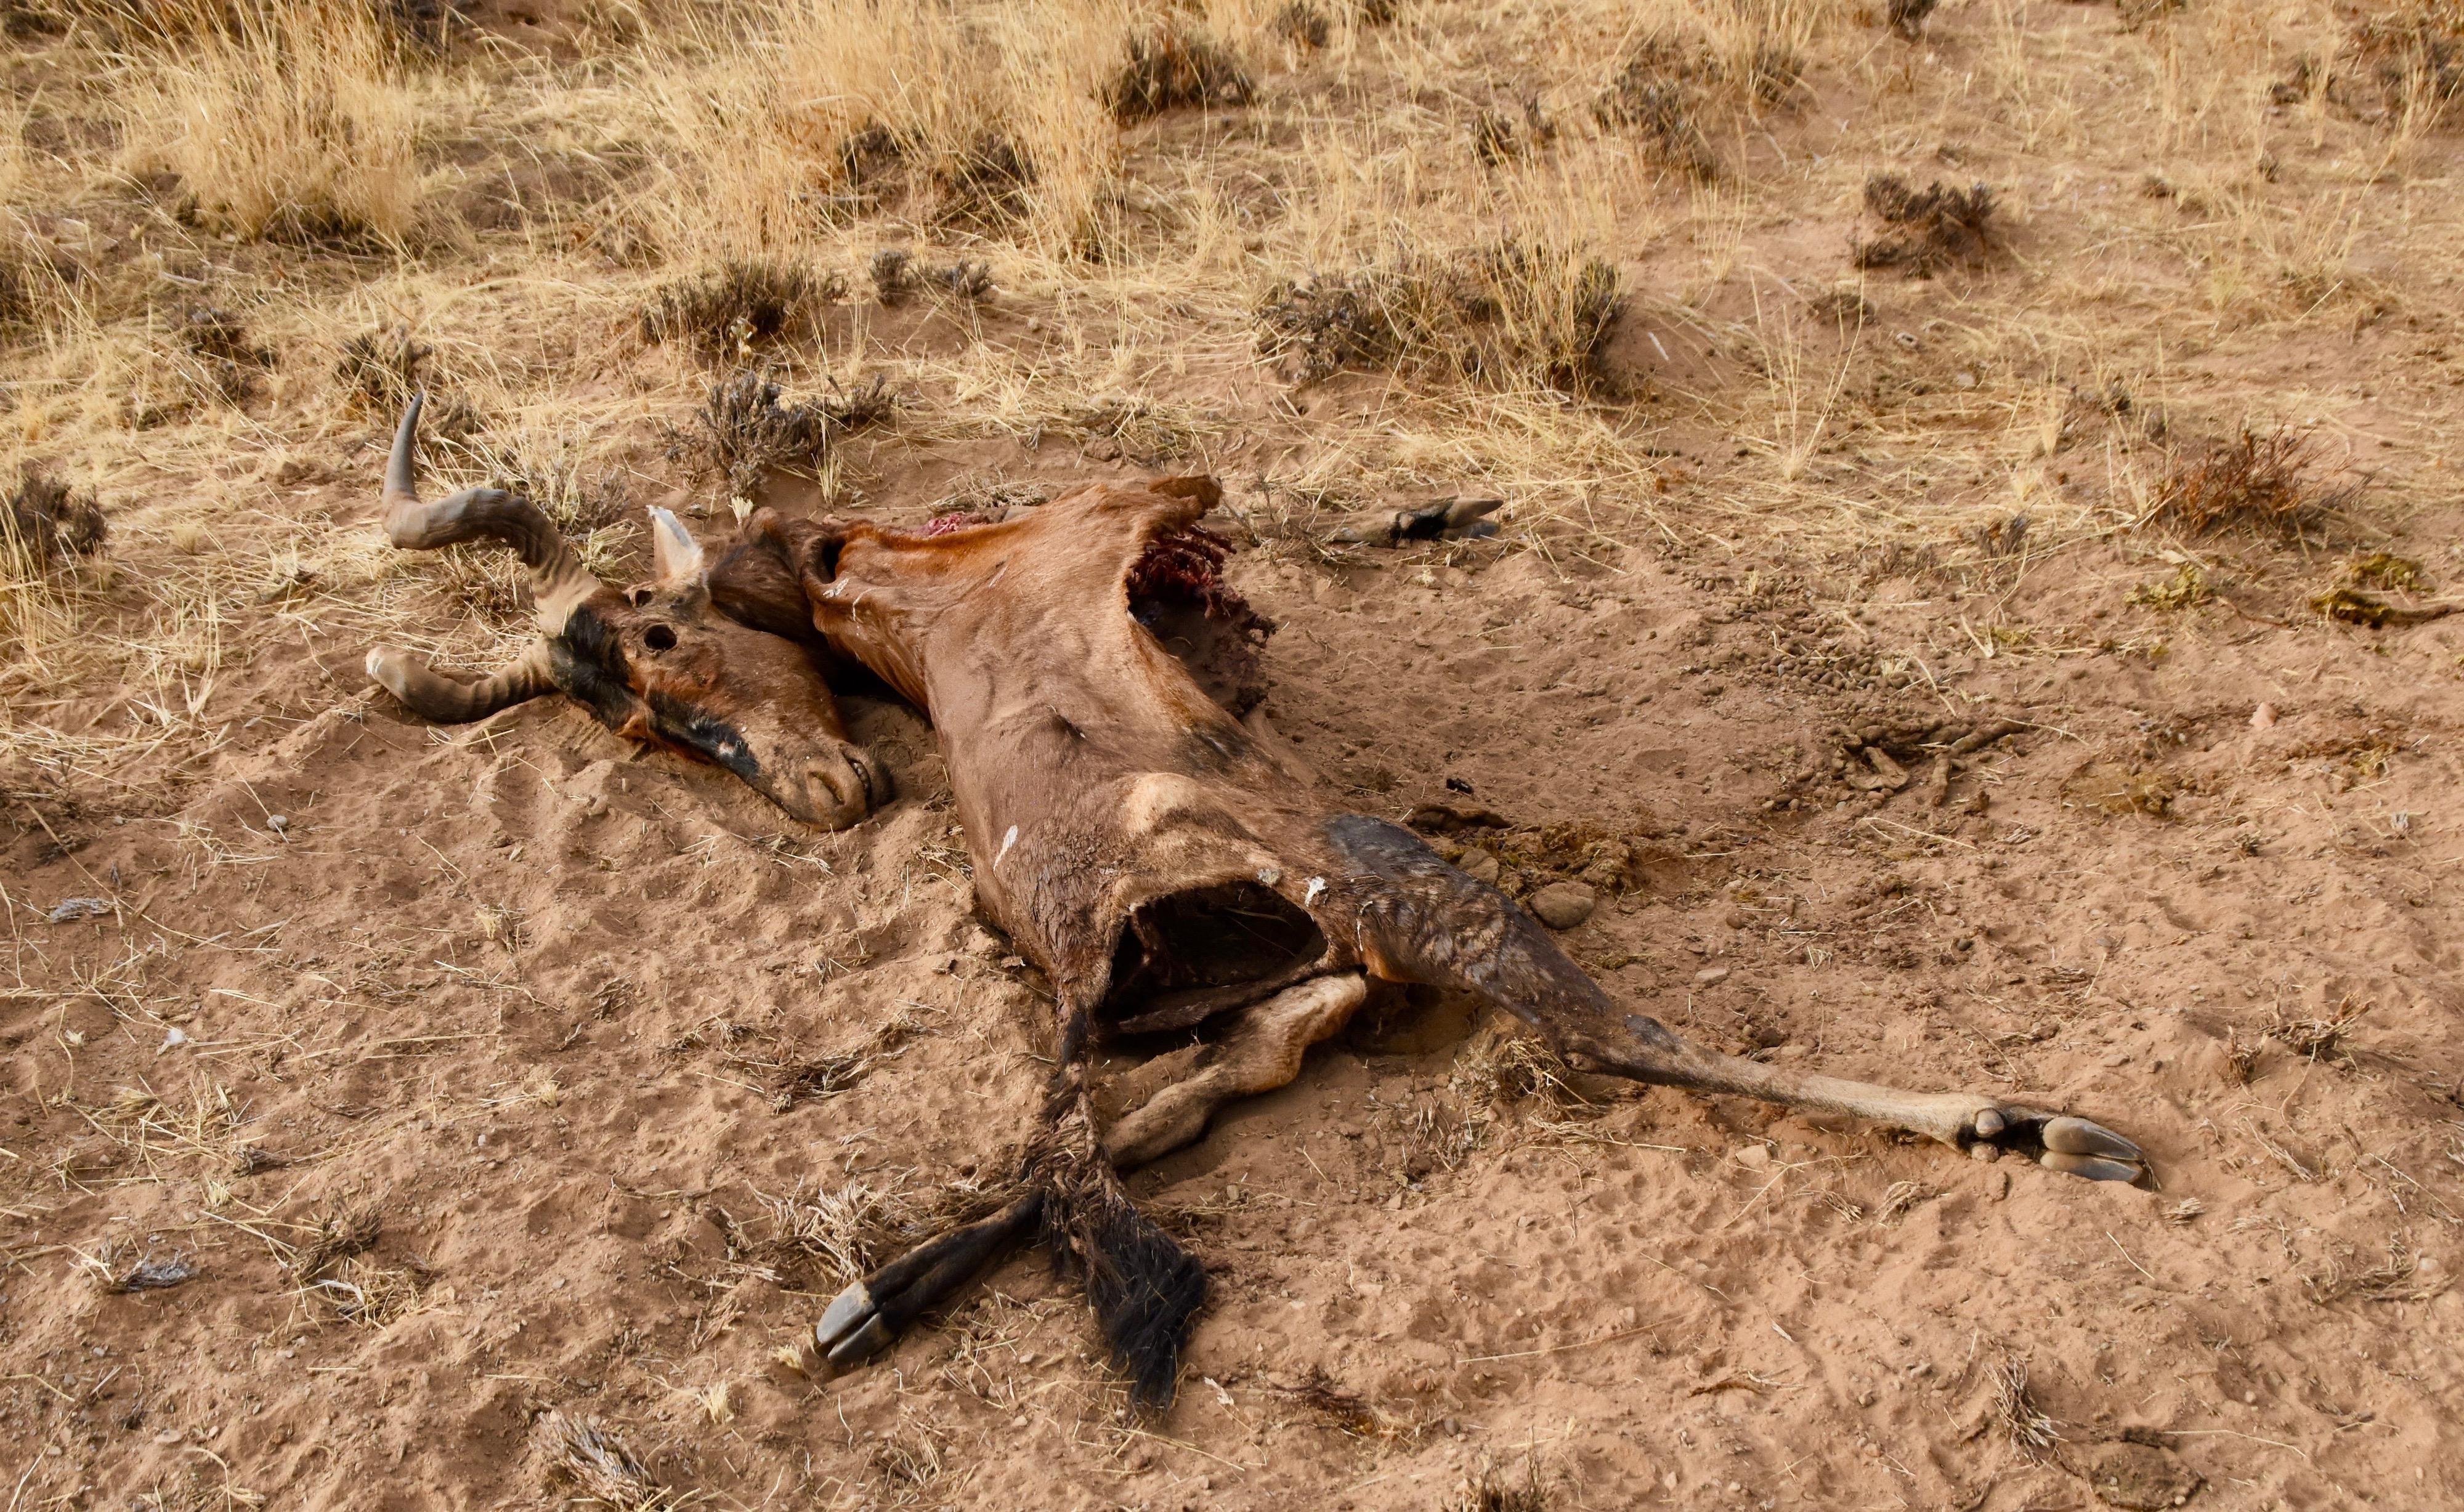 Red Hartebeest Corpse, Damaraland